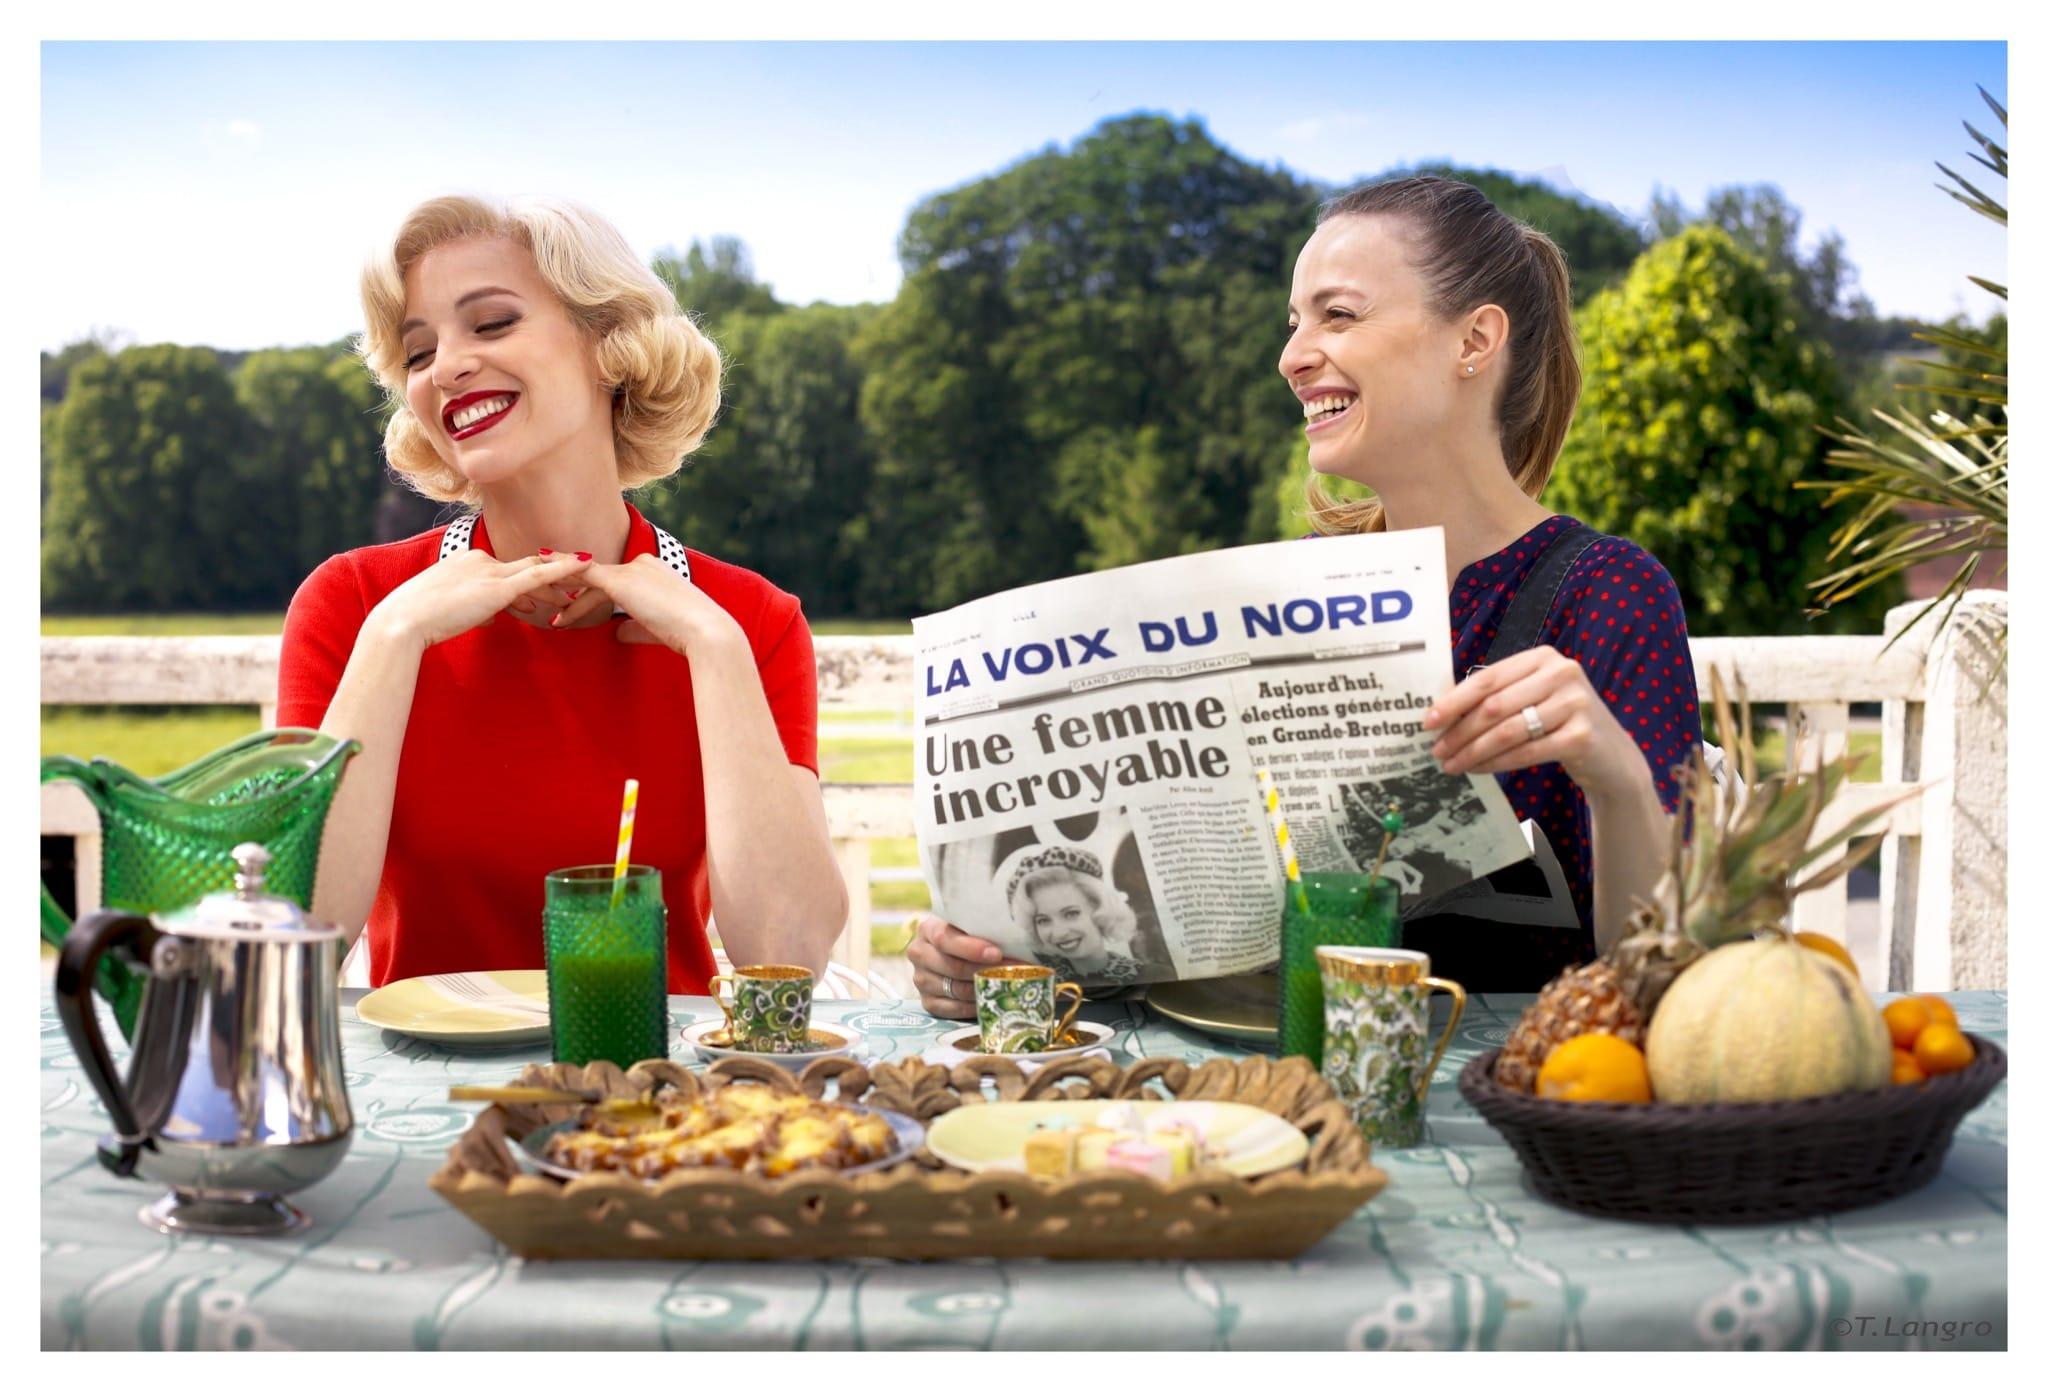 Les Petits Meurtres d'Agatha Christie imageMarlène vs Elodie FRENCK